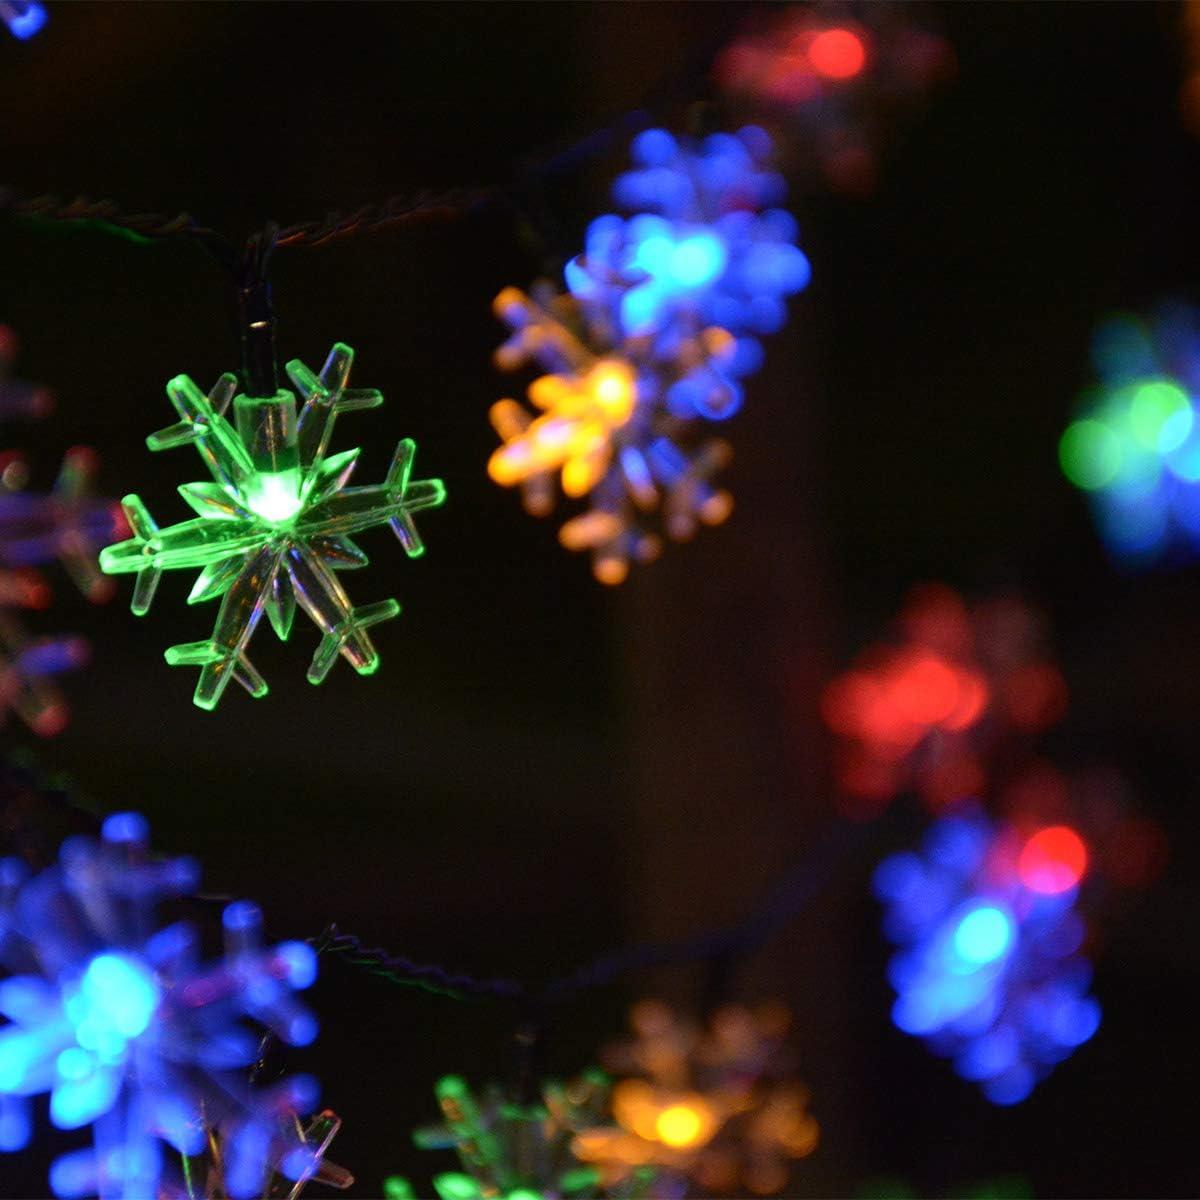 Chasgo 30Ft 50 LED Solar Snowflake Lights Multicolored, Waterproof Solar Snowflake Christmas String Lights for Christmas Tree, Yard, Patio, Garden Decor